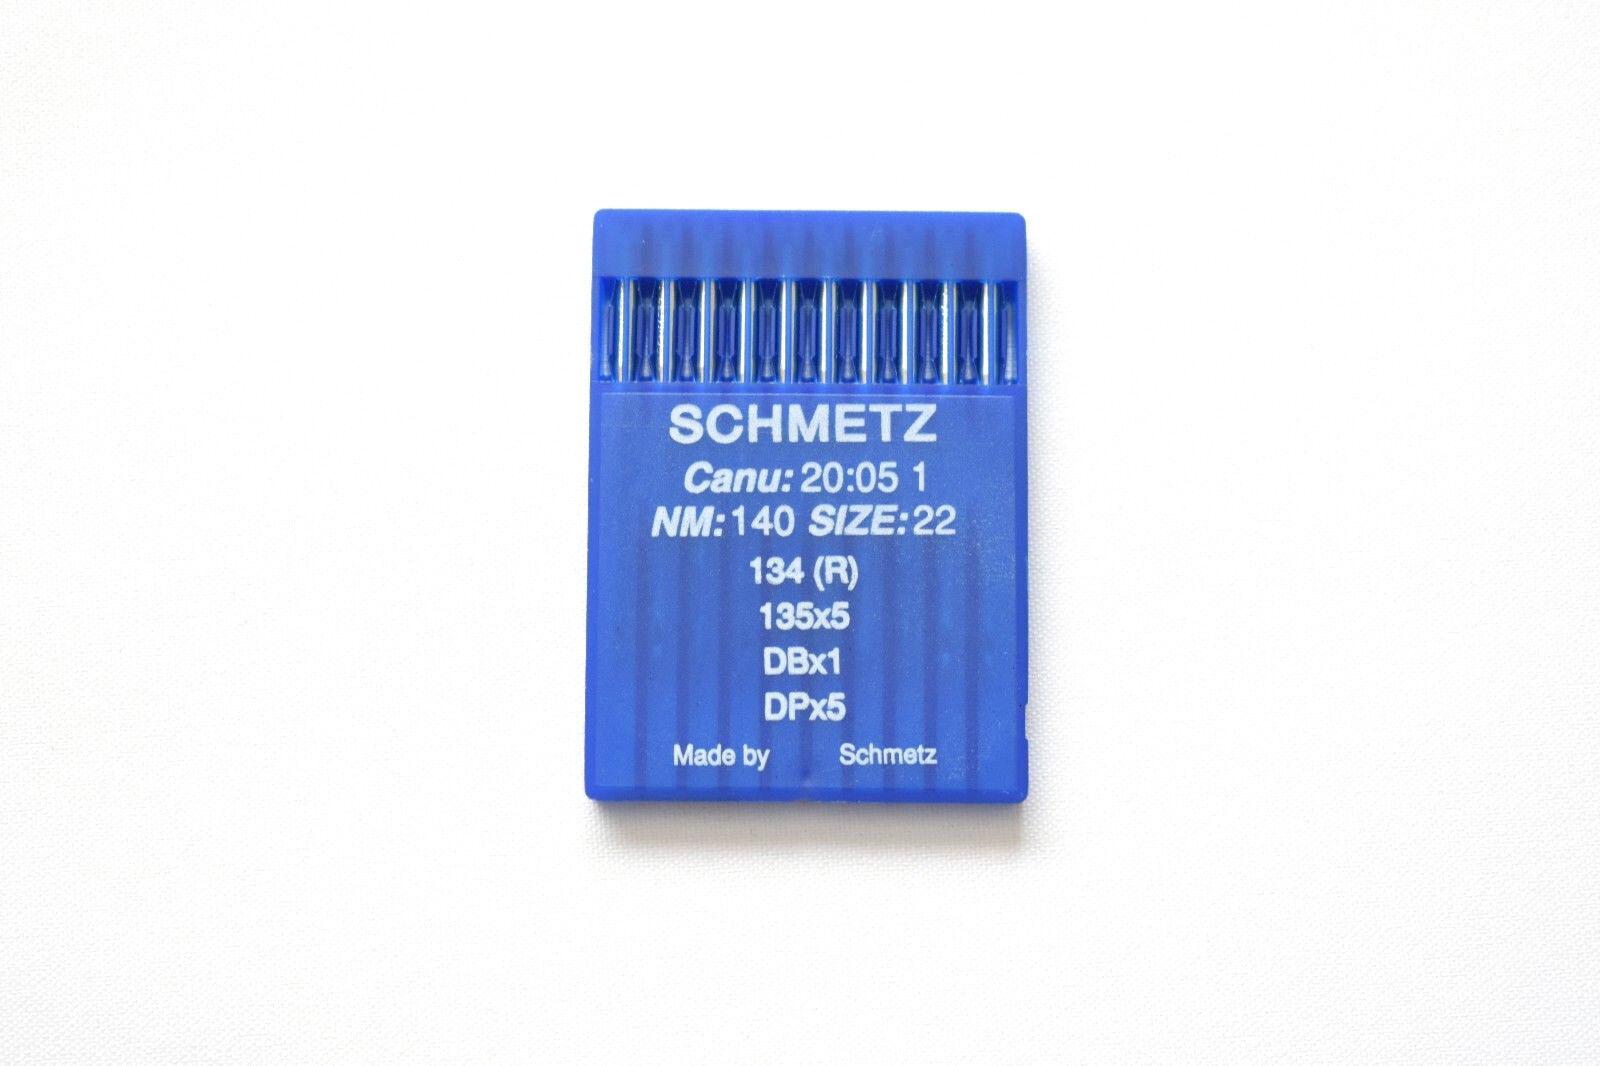 SCHMETZ PFX134LR 135X8 RTW 134LR NM:120SIZE:19 INDUSTRIAL SEWING MACHINE NEEDLES